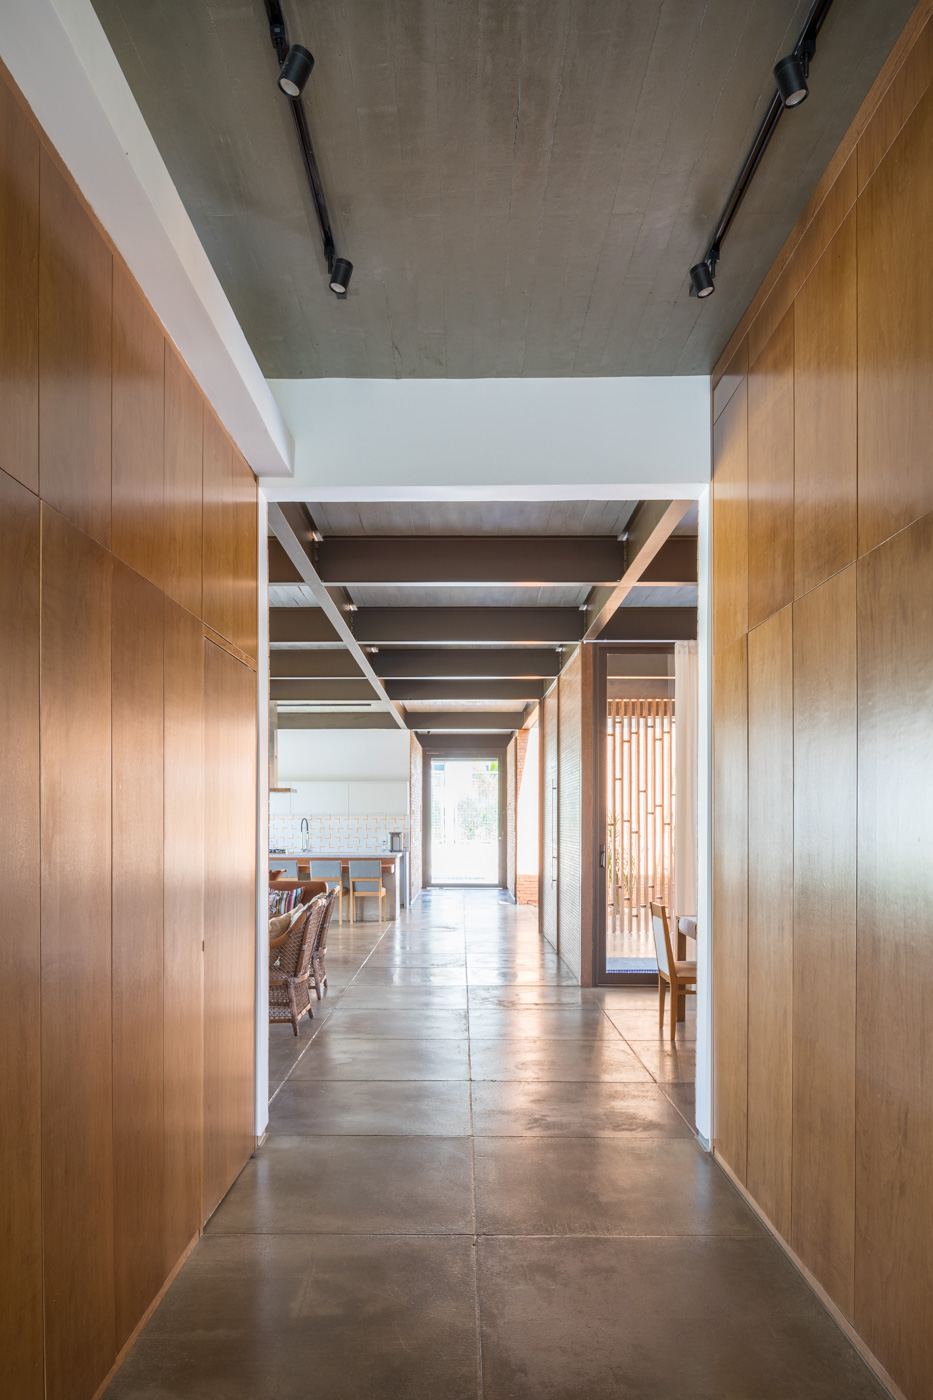 Mova-arquitetura-foto-haruo-mikami_B_228-HDR_Baixa.jpg